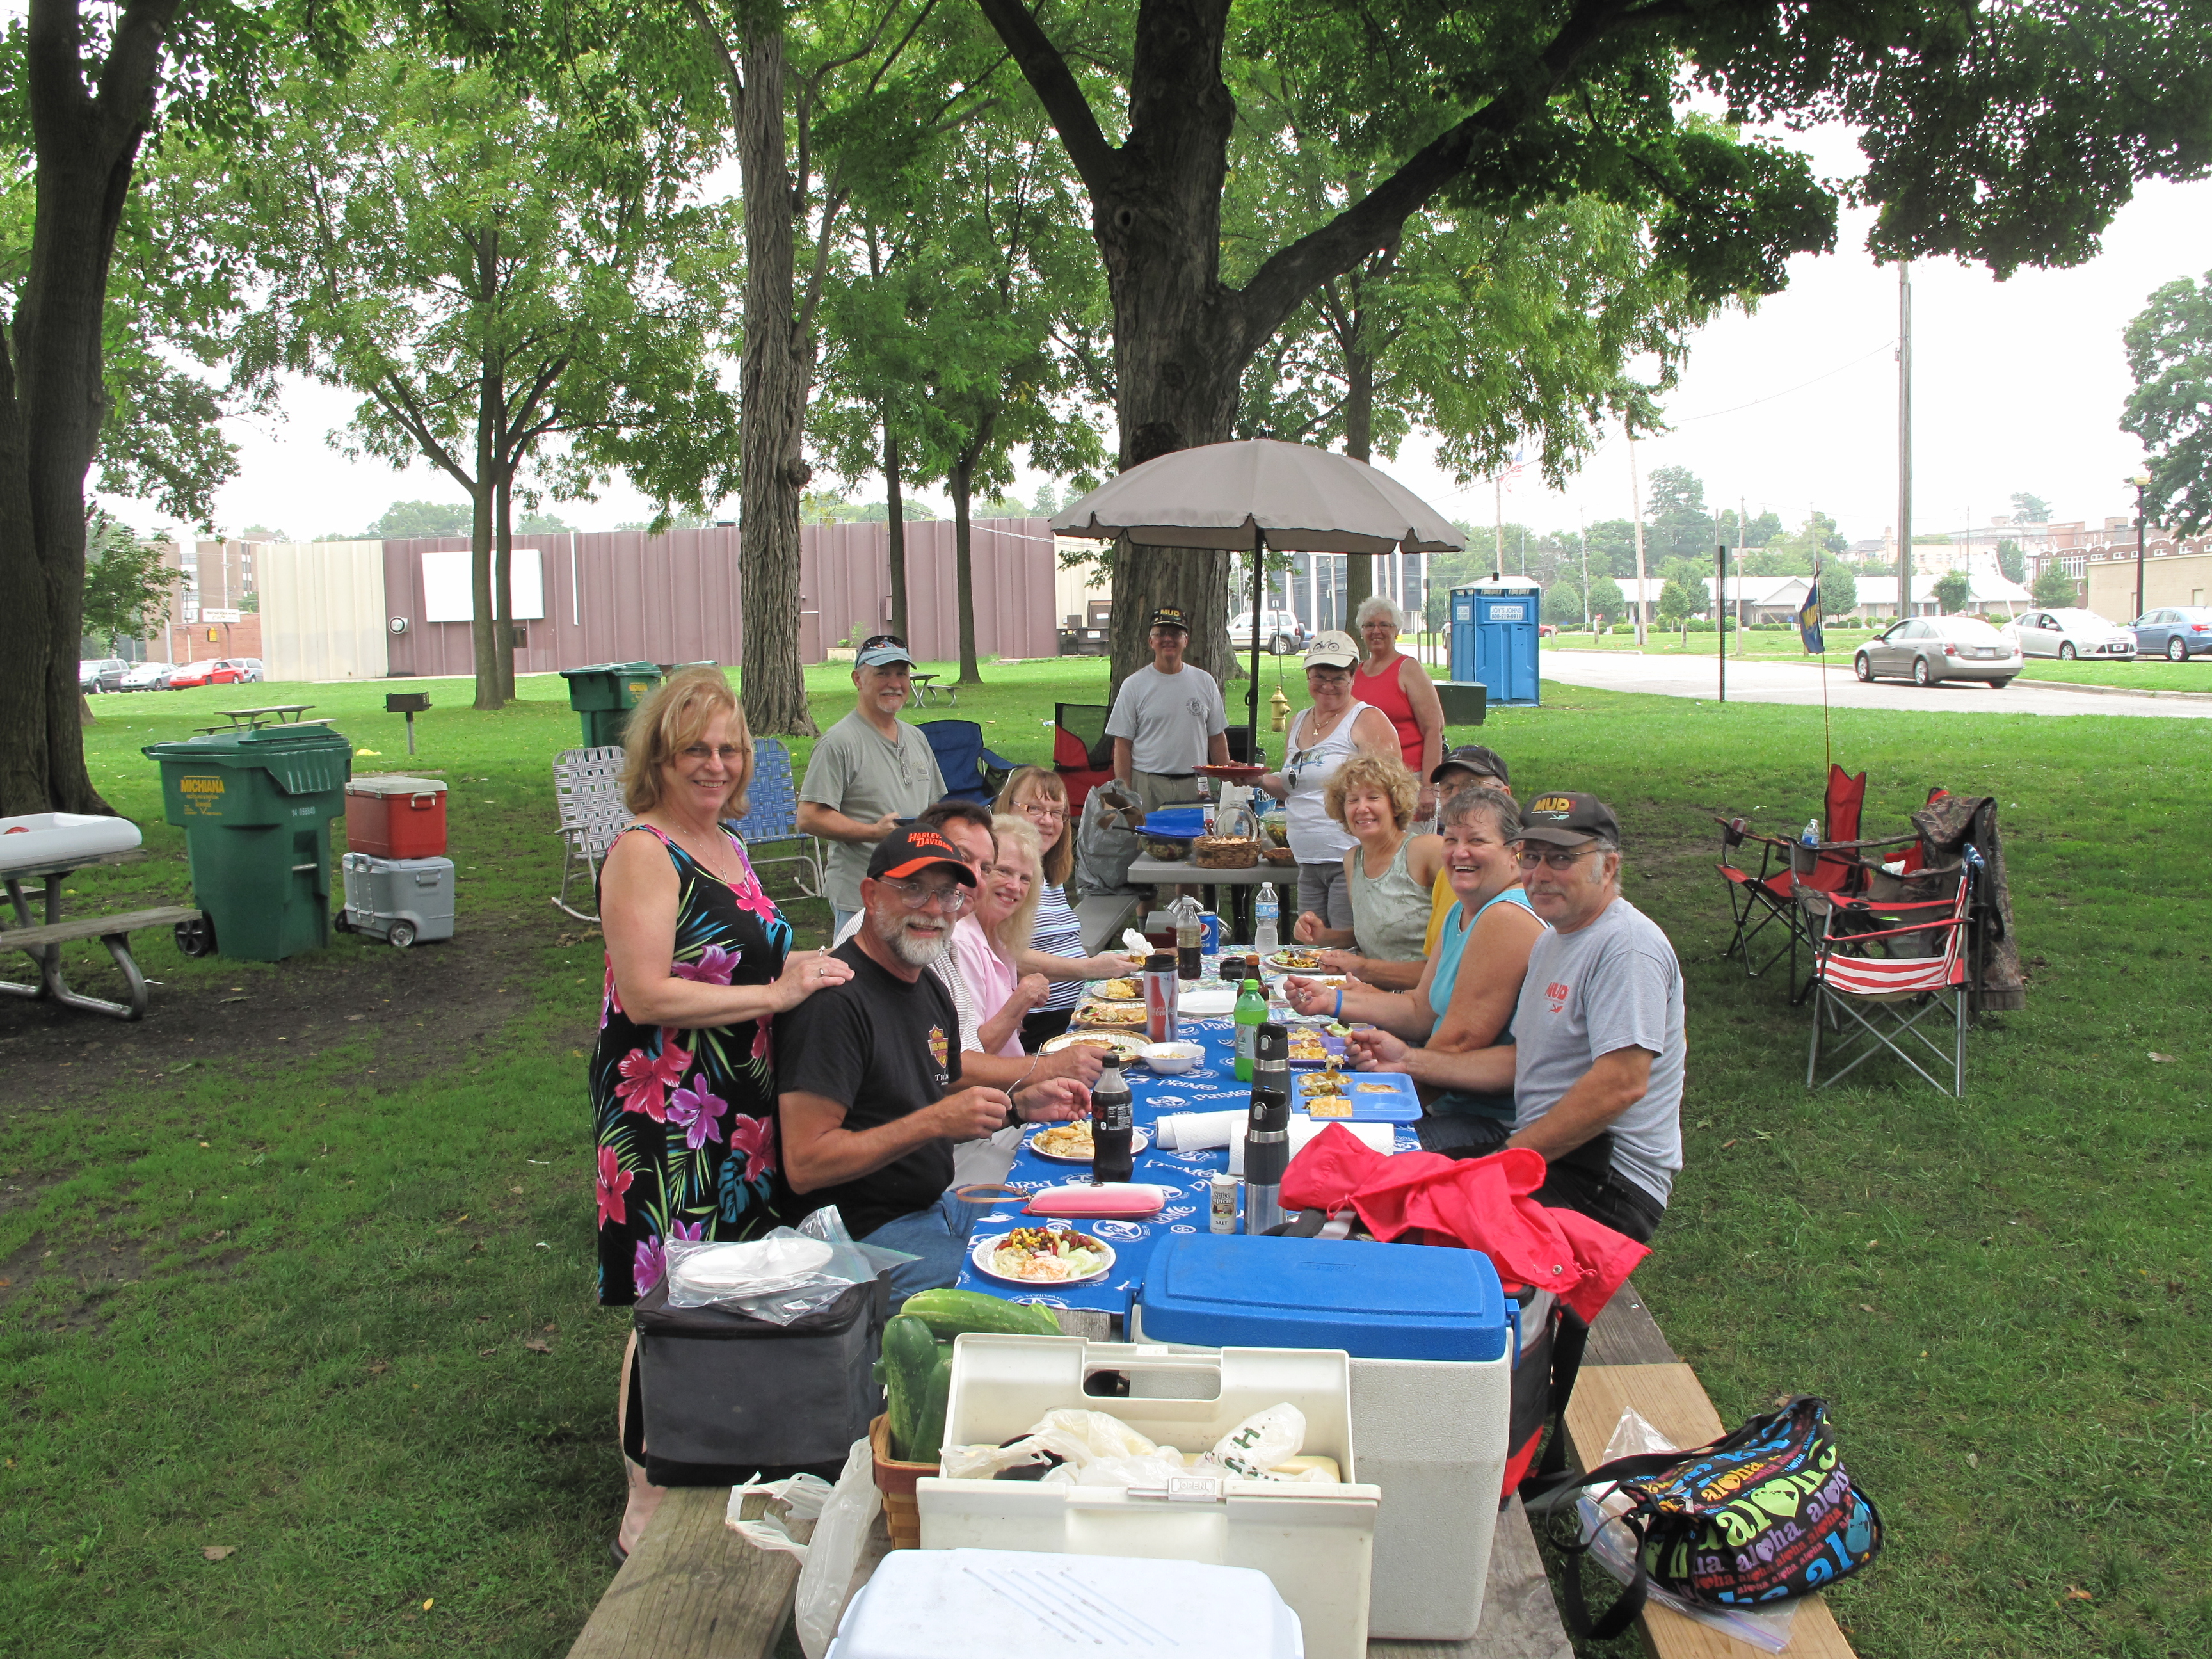 Some members of the MUD Club at Riverside Park in Niles, MI.